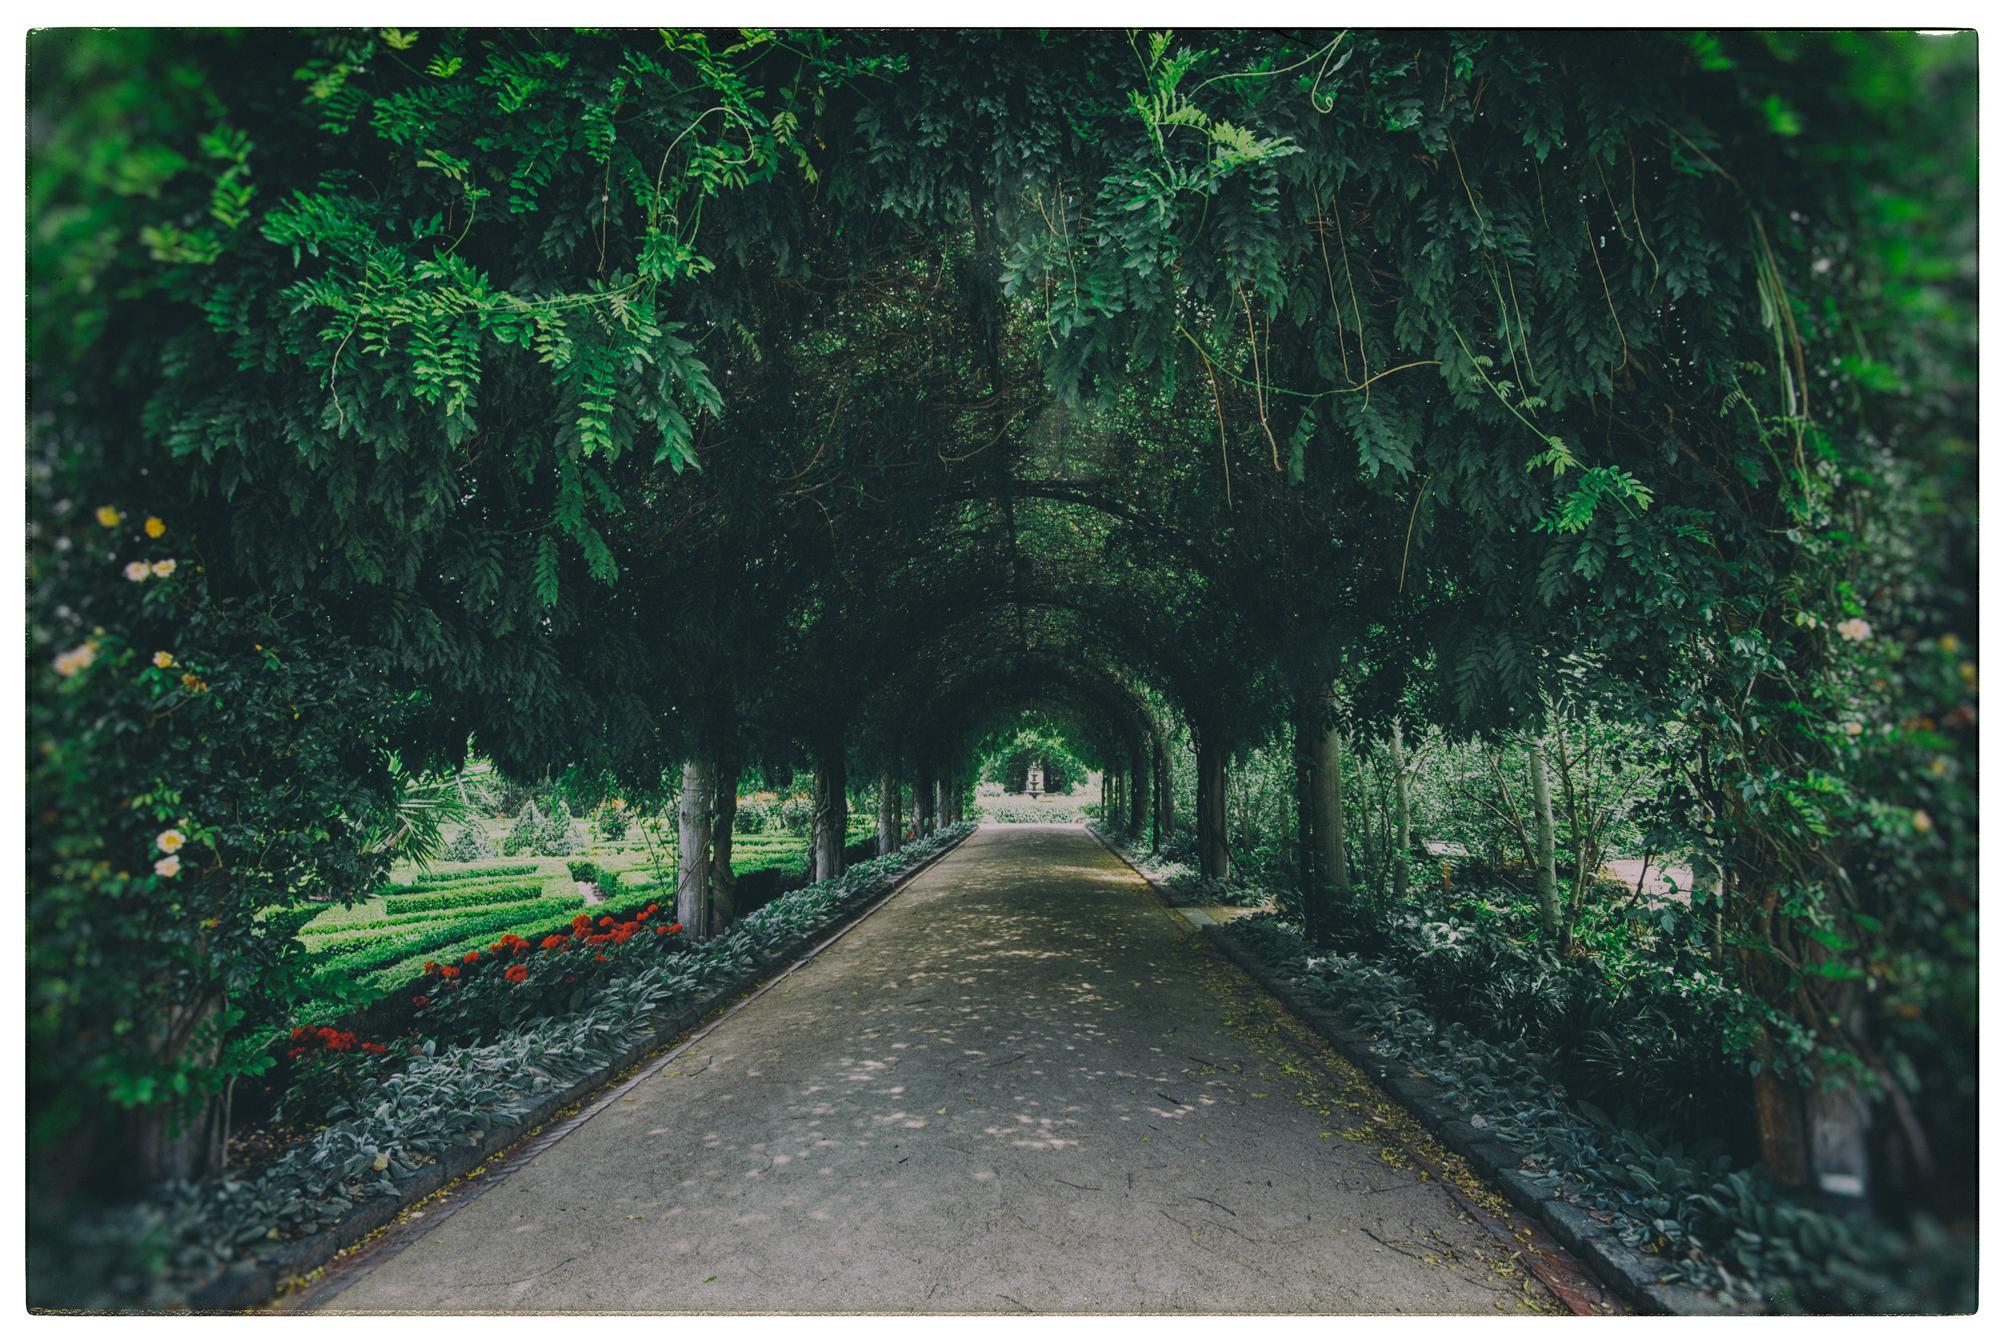 wisteria-archway-1s.jpg